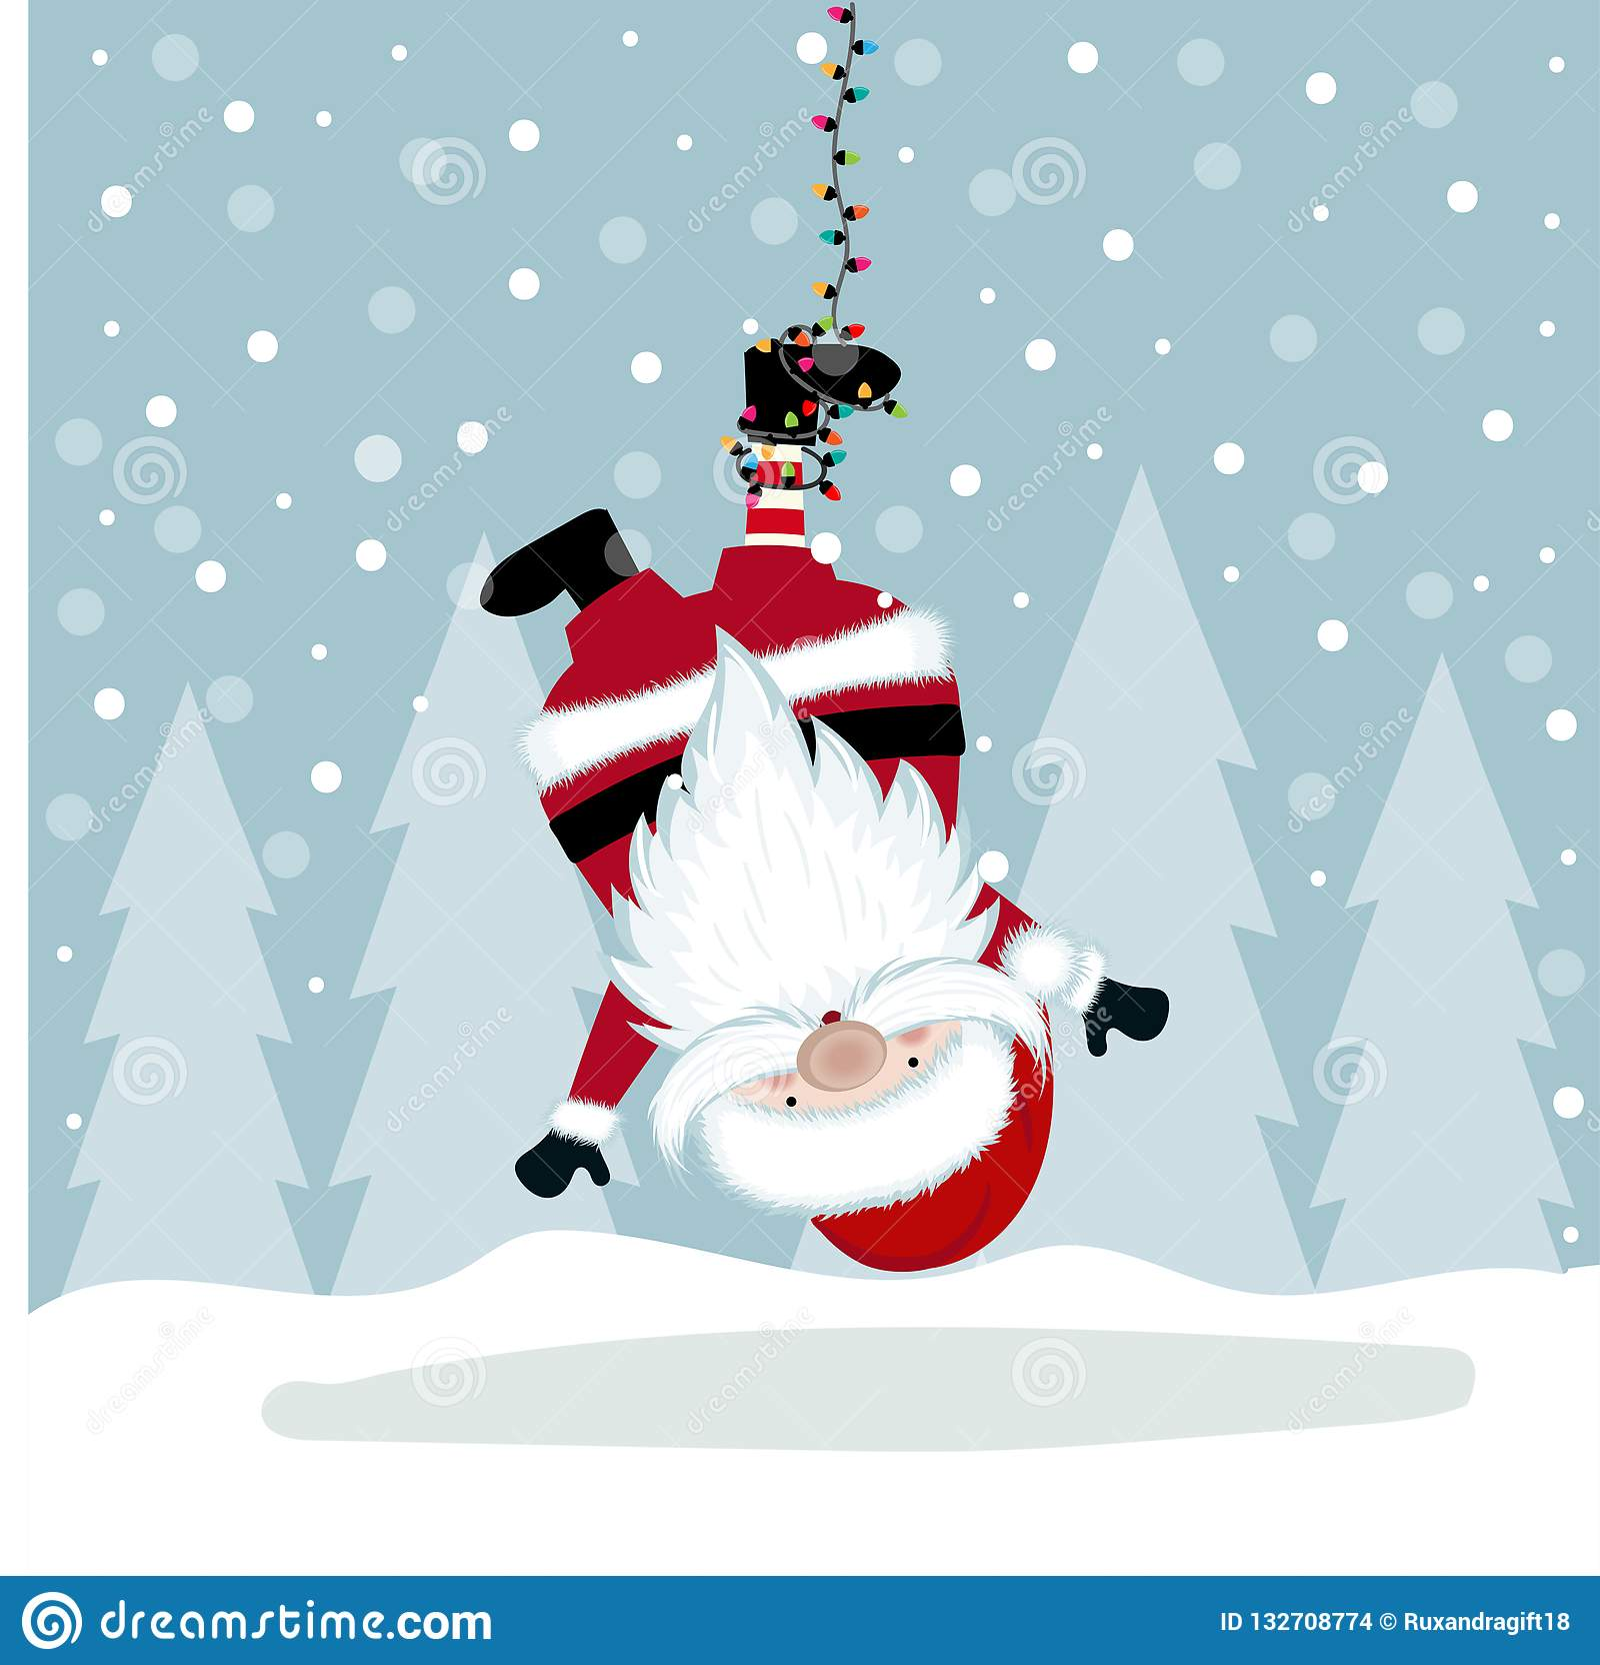 Illustration Drole De Noel Avec Accrocher Santa Illustration De Vecteur Illustration Du Drole Noel 132708774